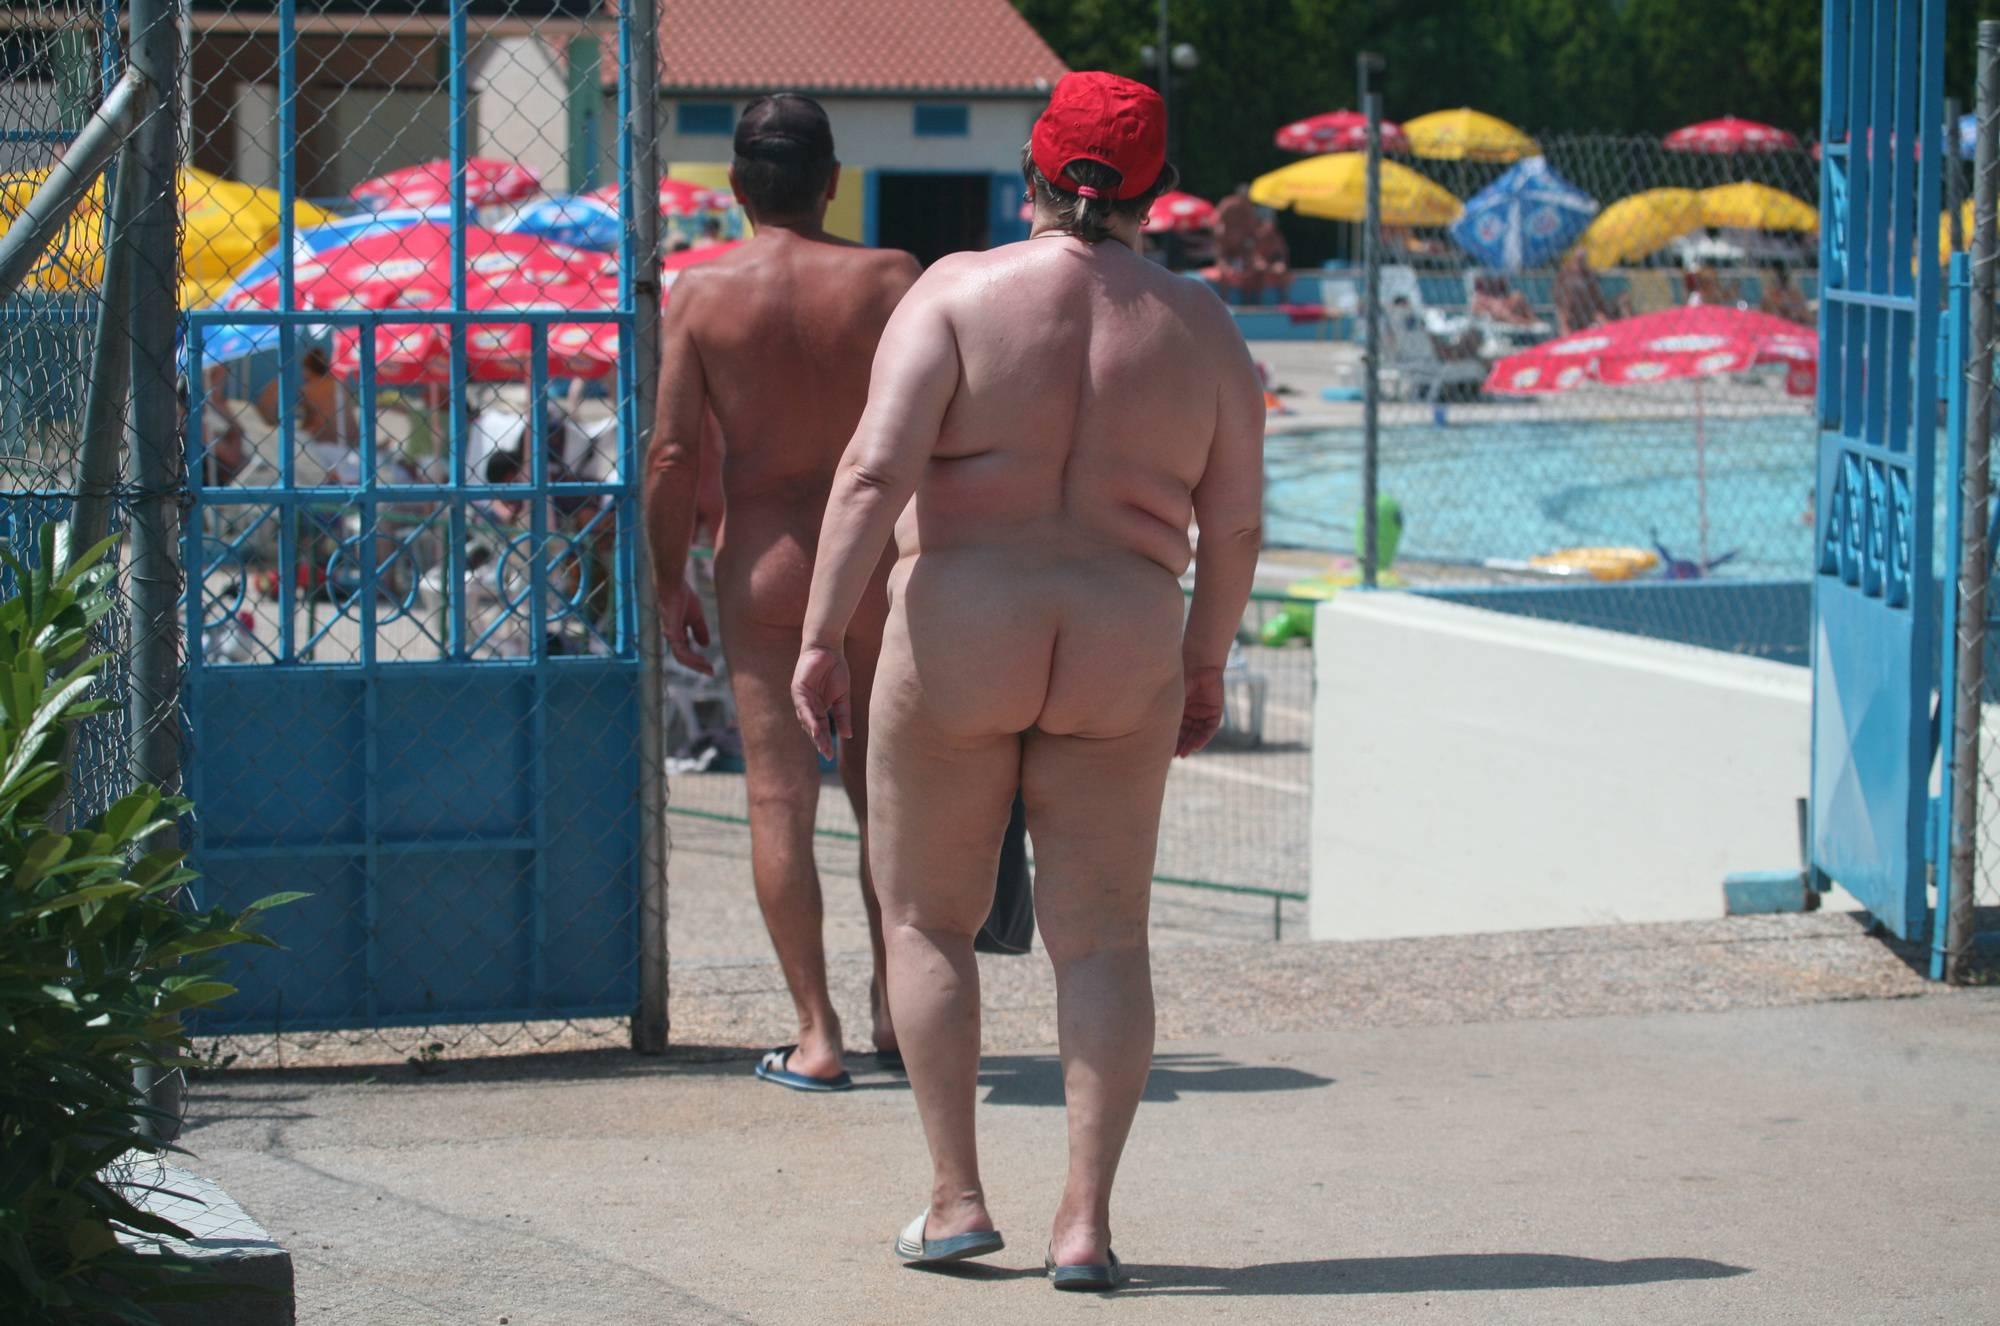 Pure Nudism Pics-Nudist Pool Guests Enter - 3